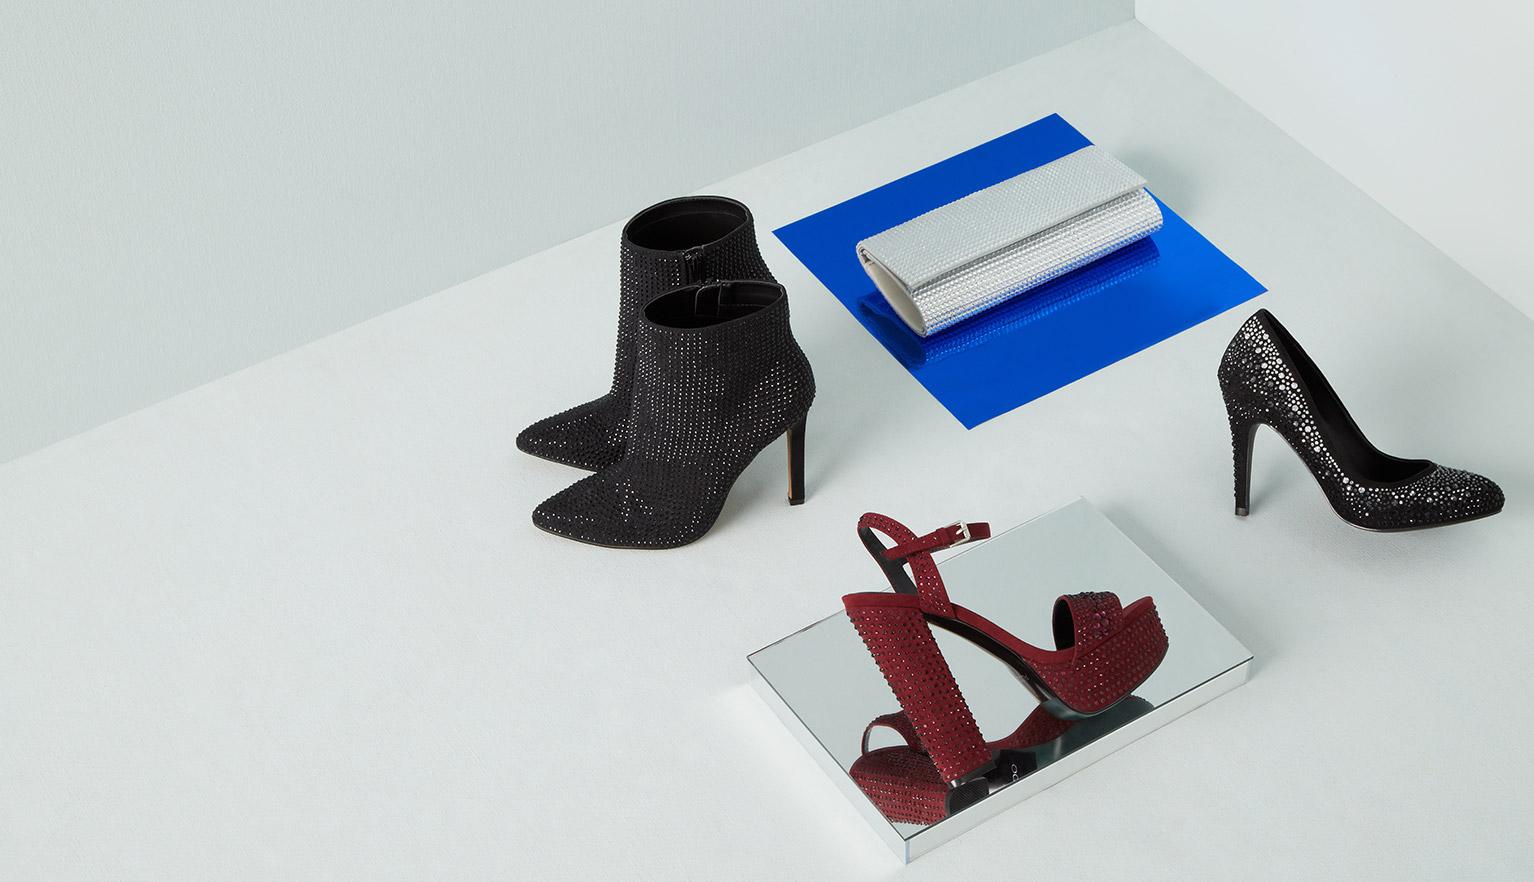 Shoes, boots, sandals, handbags & accessories